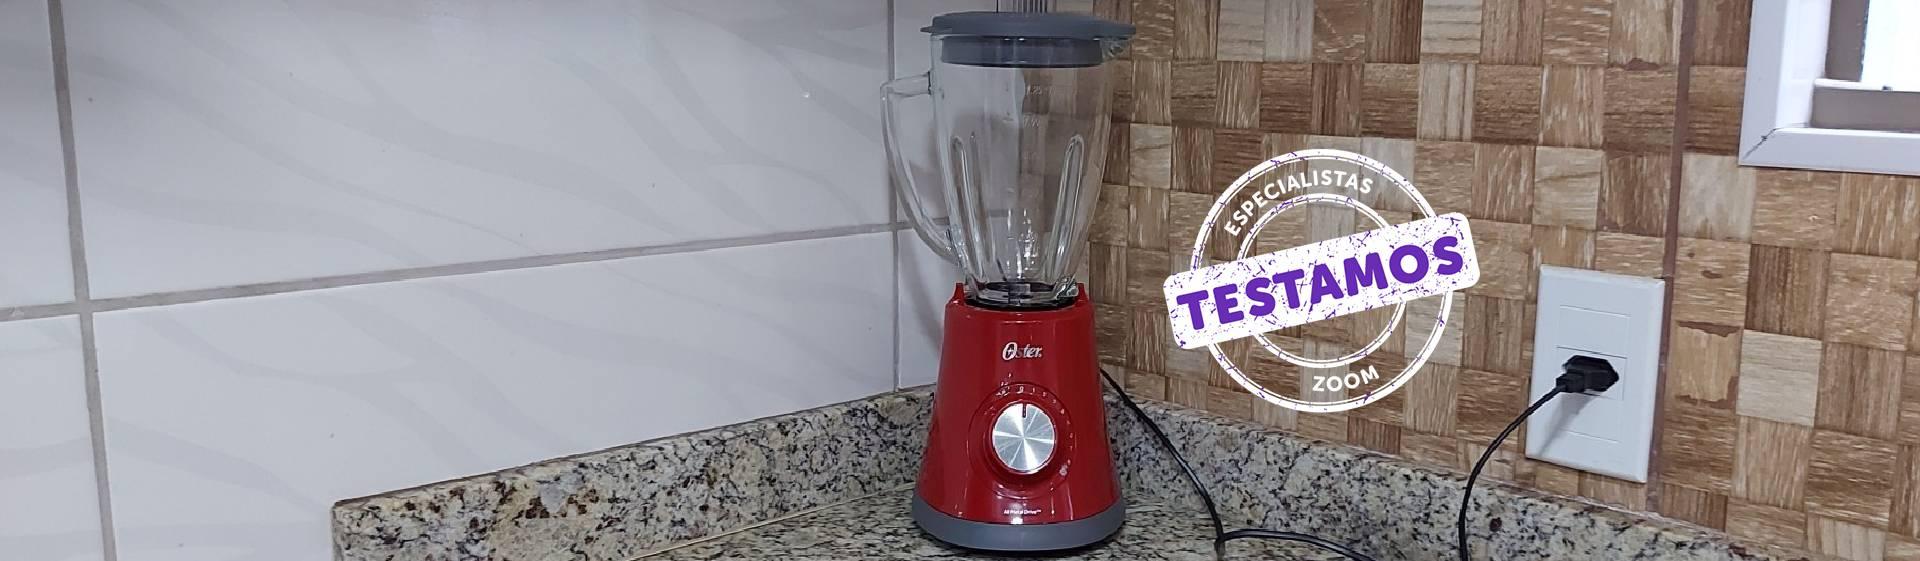 Liquidificador Oster Super Chef: muito eficiente, mas barulhento